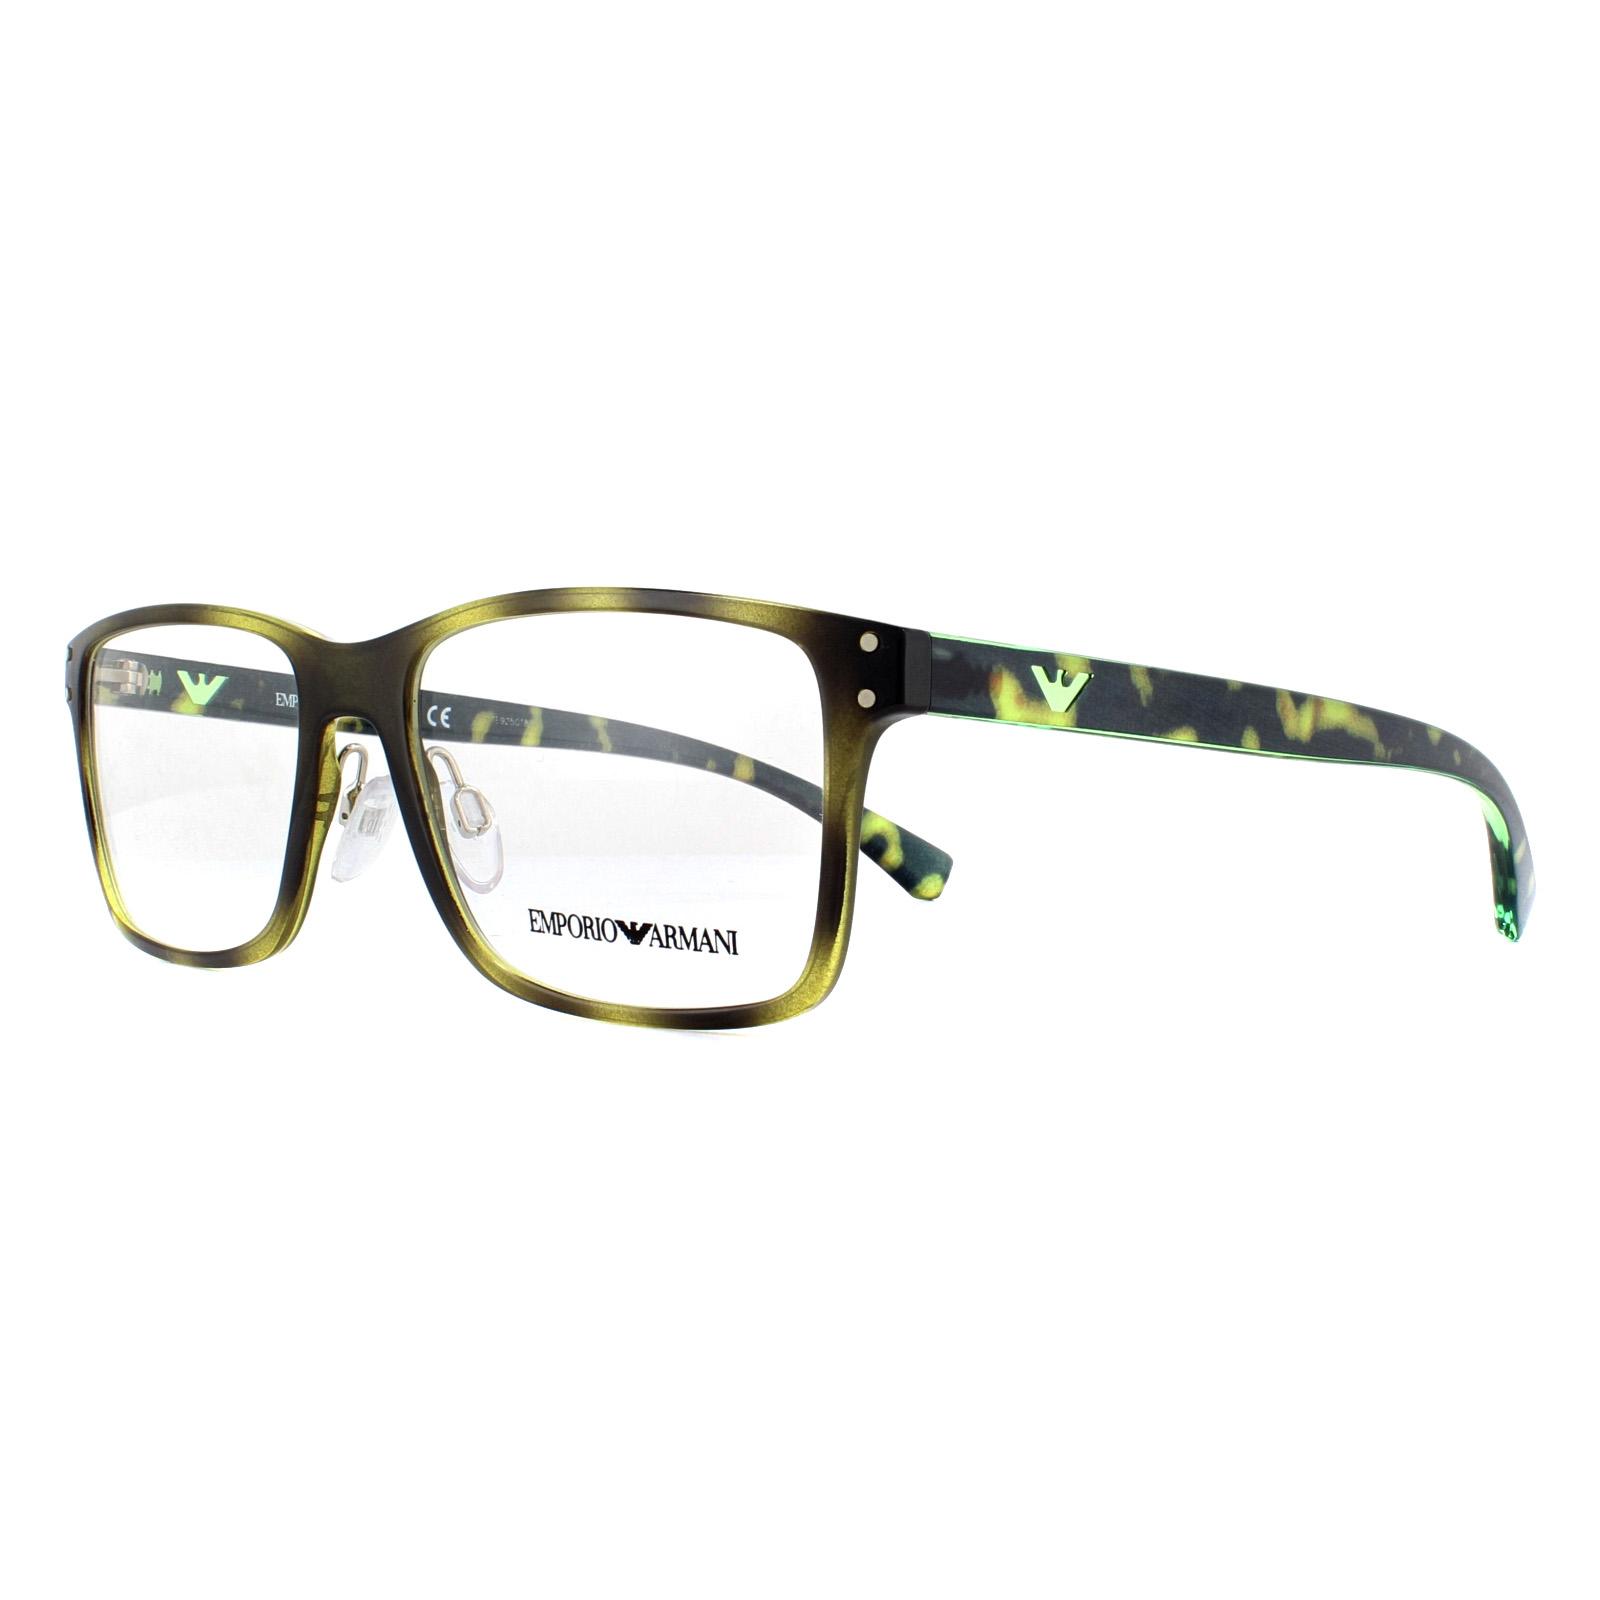 2818b3050219 Sentinel Emporio Armani Glasses Frames EA 3114 5026 Havana 53mm Mens